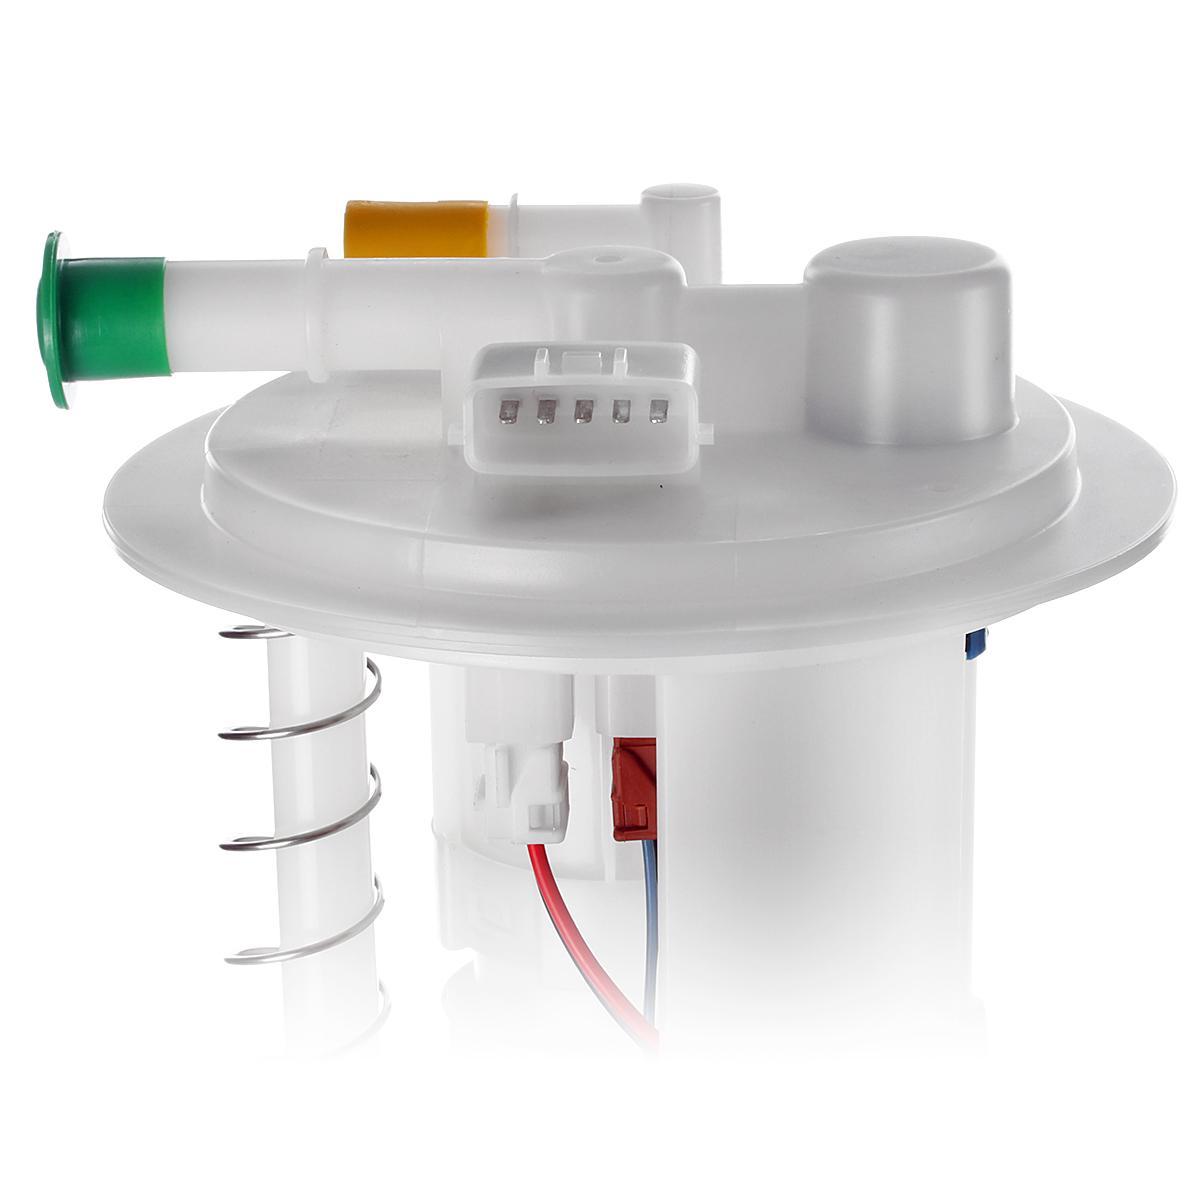 E8743m Fuel Pump Assembly For Nissan Frontier Pathfinder Xterra Suzuki Equator Ebay